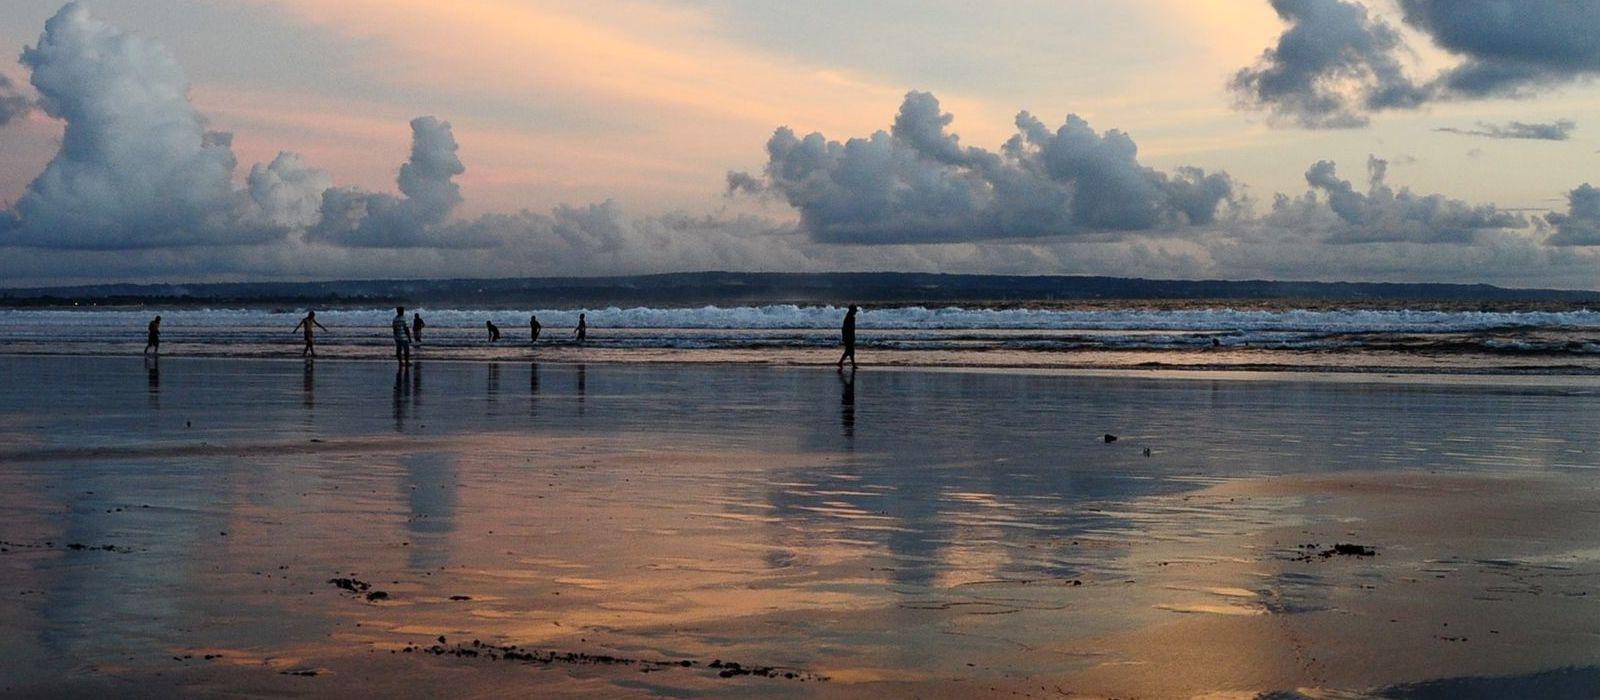 Off the Beaten Path in Bali & Java Tour Trip 2